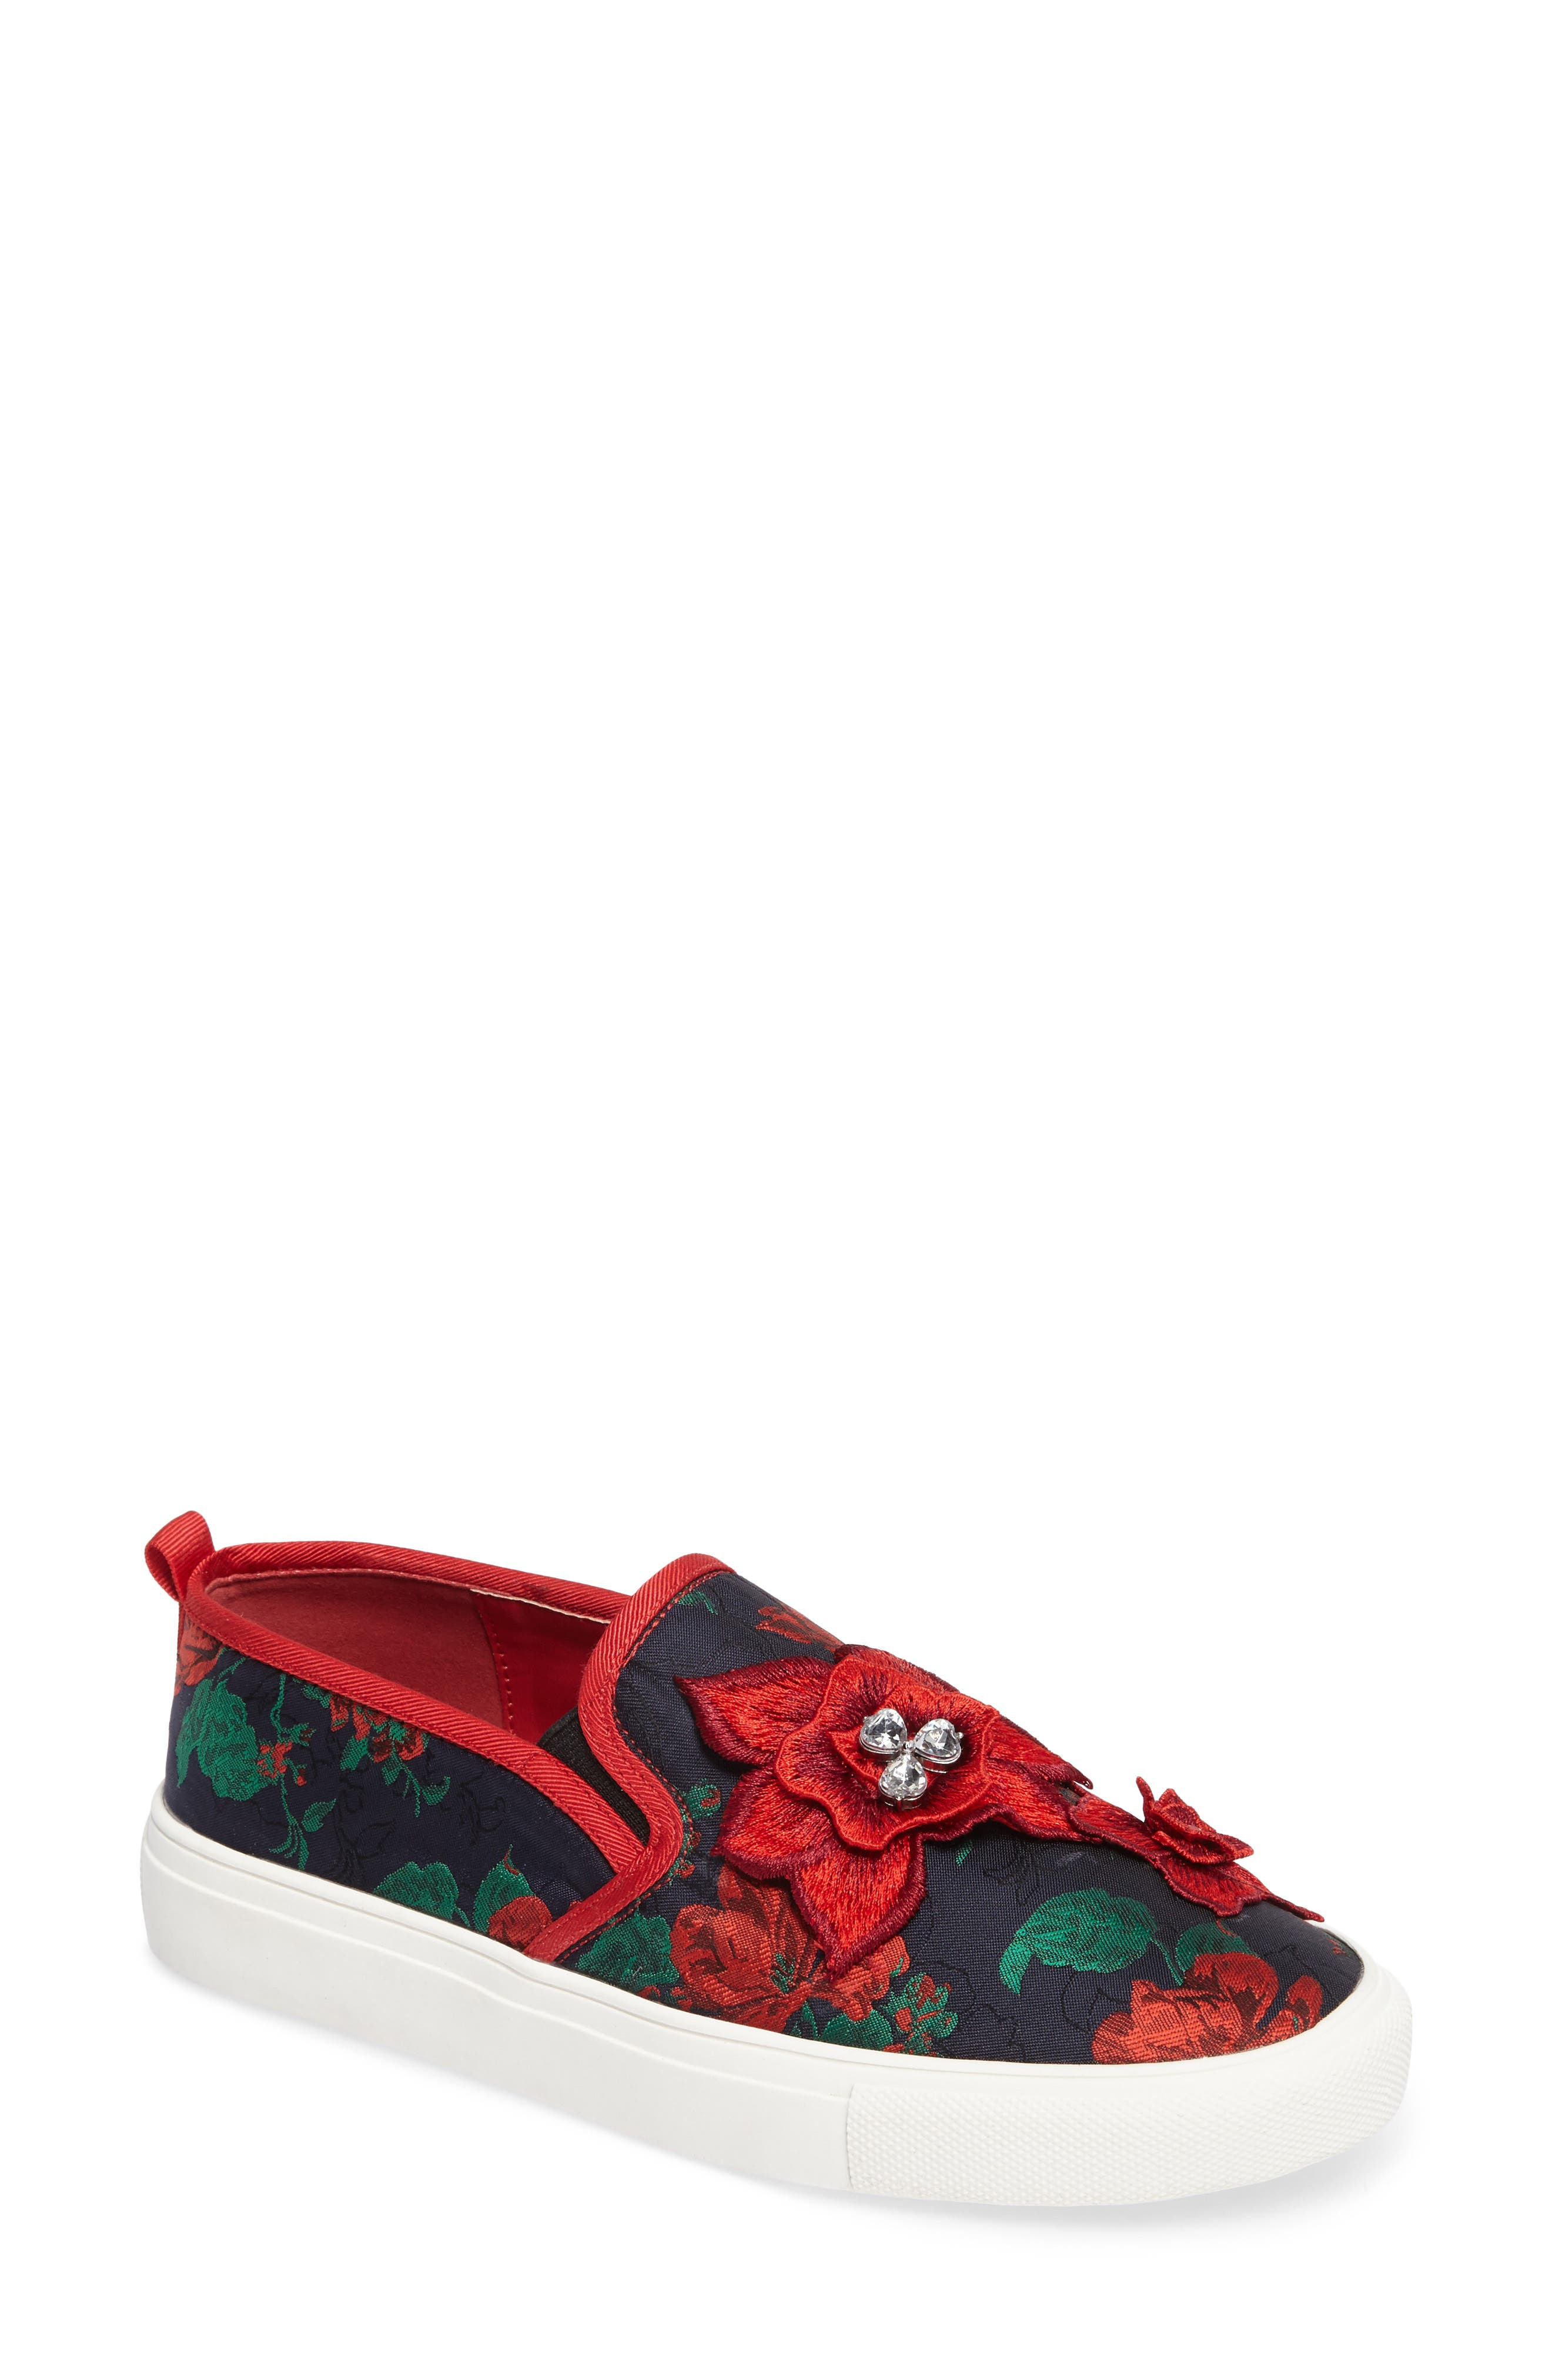 Main Image - Topshop Tessa Embroidered Slip-On Sneaker (Women)